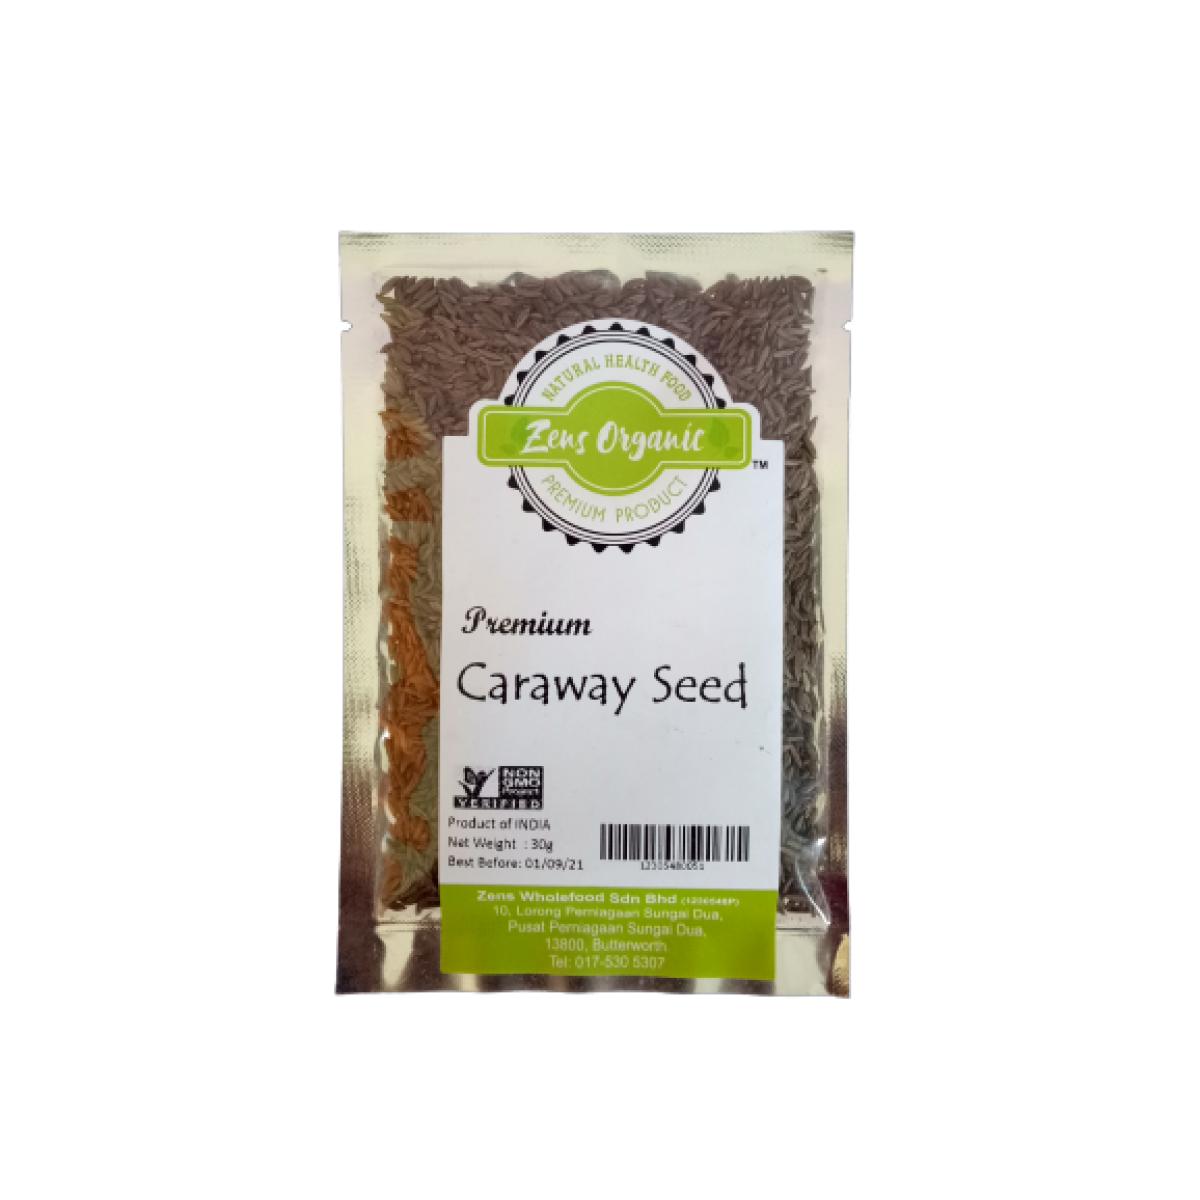 Zens Organic Premium Caraway Seed 30g (Product Of India)